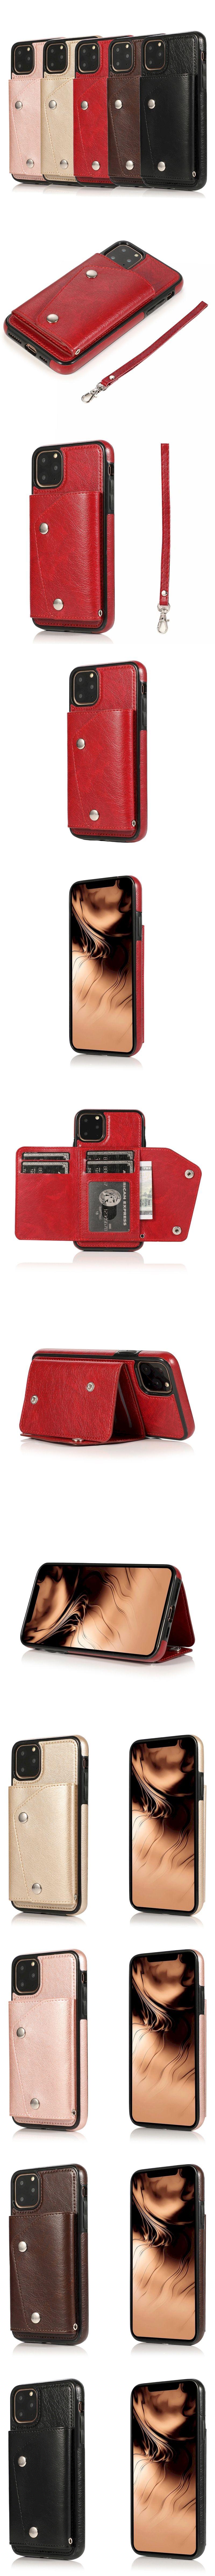 275-Apple-相片層插卡背蓋手機殼(含掛繩)(IPhone 11 Pro Max)